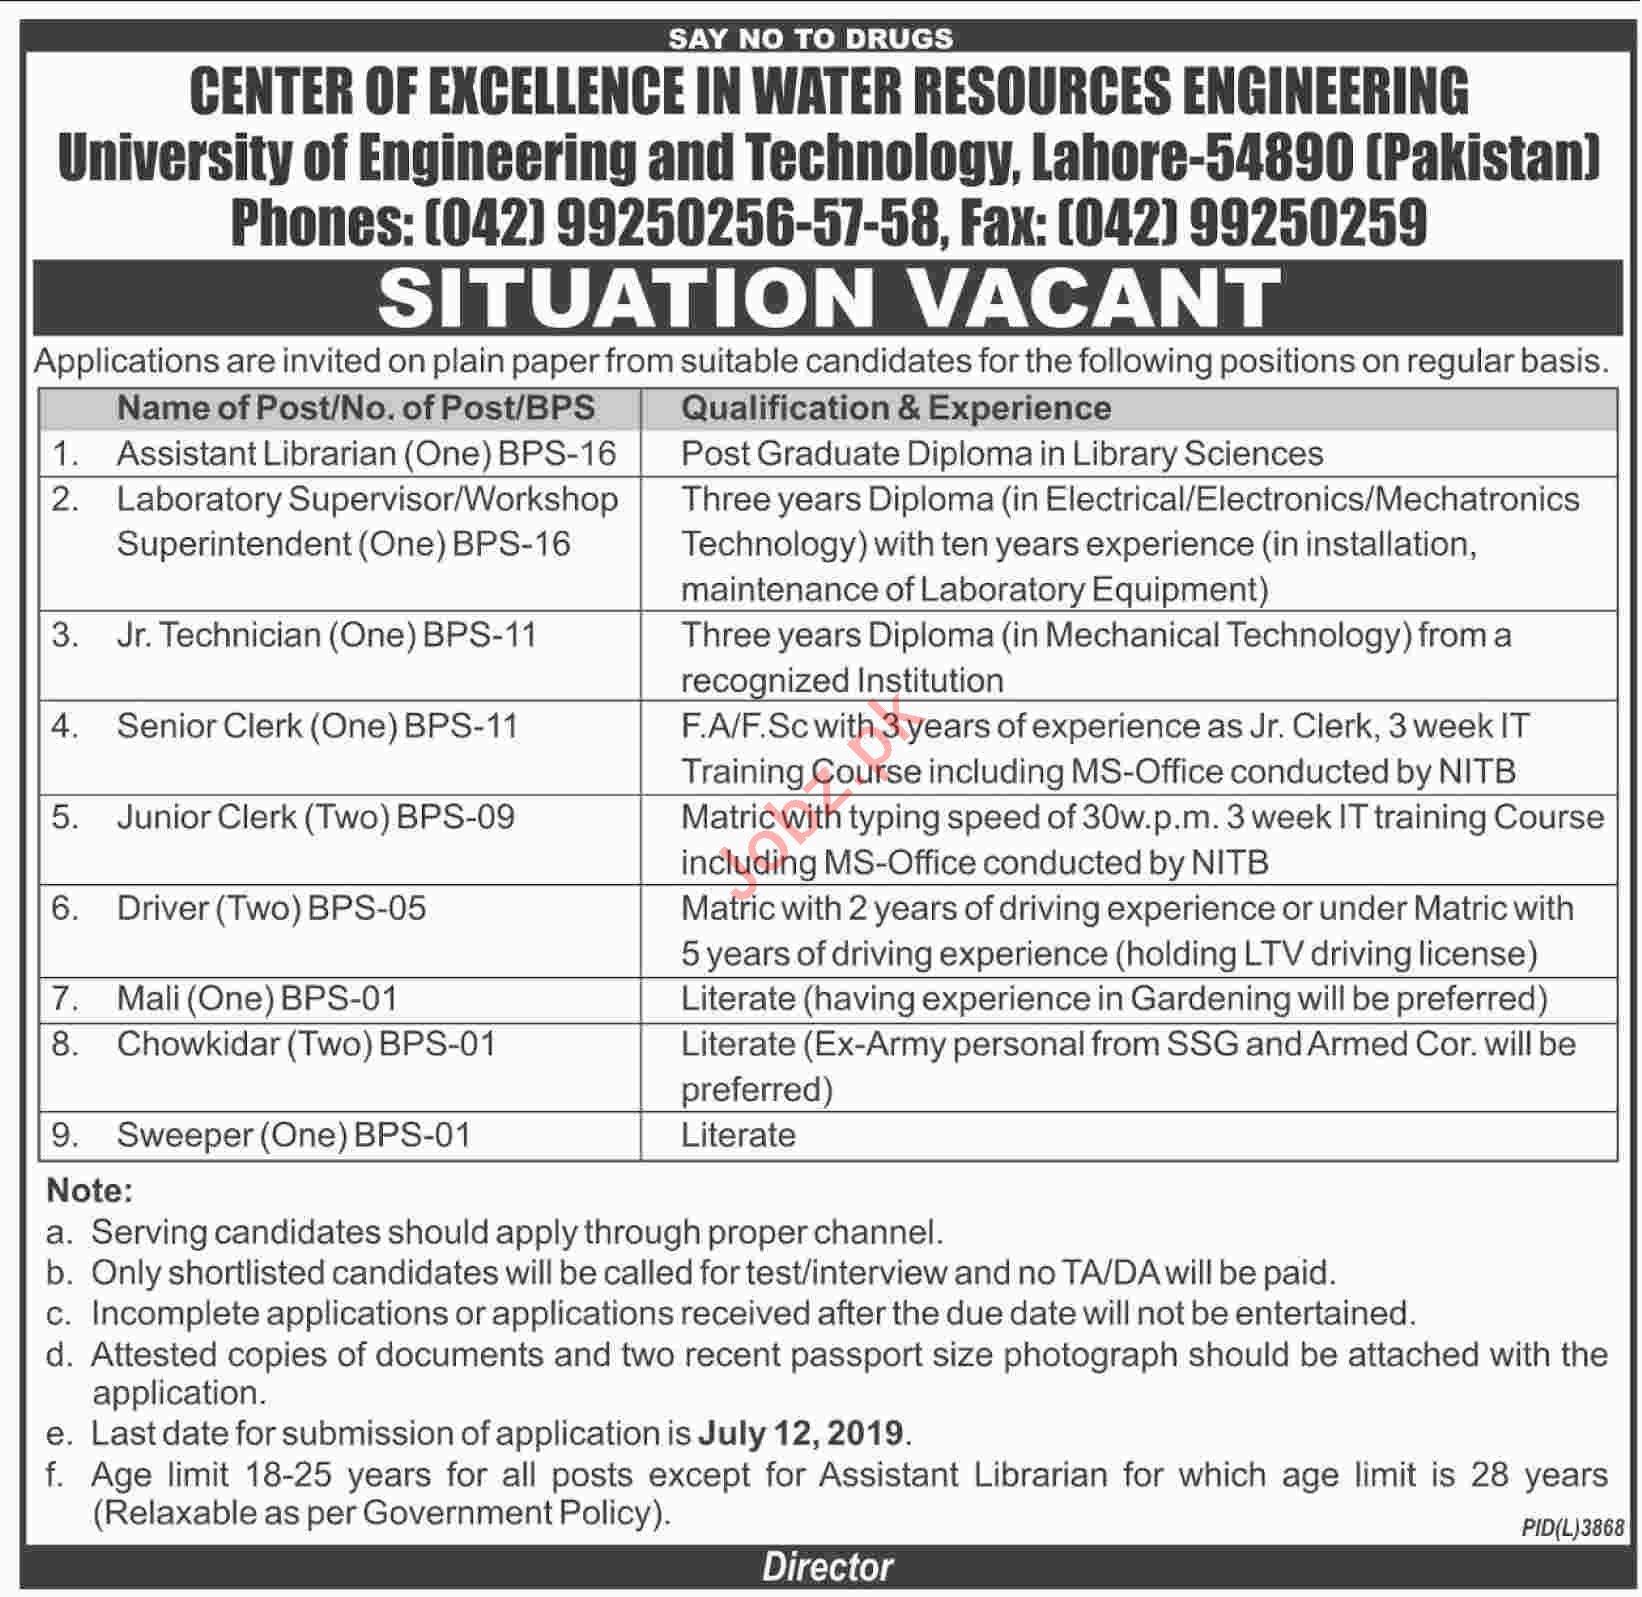 University of Engineering & Technology UET Lahore Jobs 2019